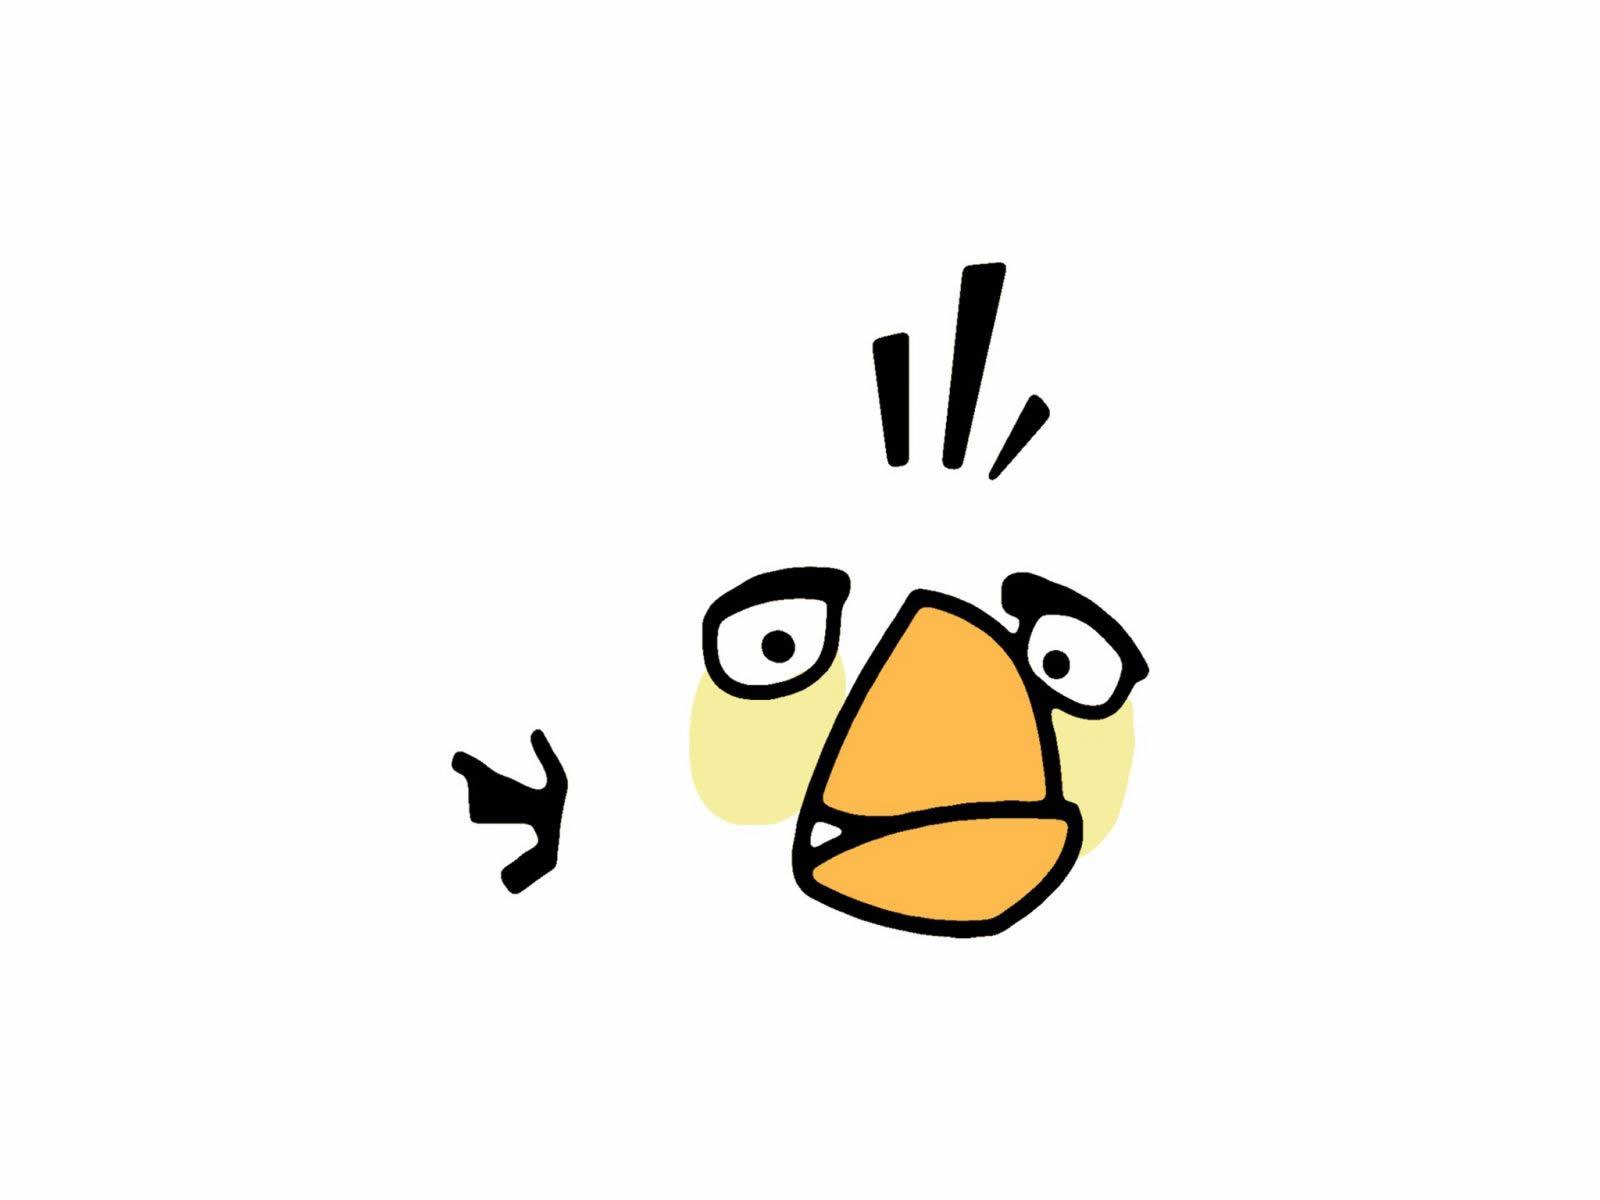 279732_Papel-de-Parede-Angry-Birds-Passaro-Branco_1600x1200